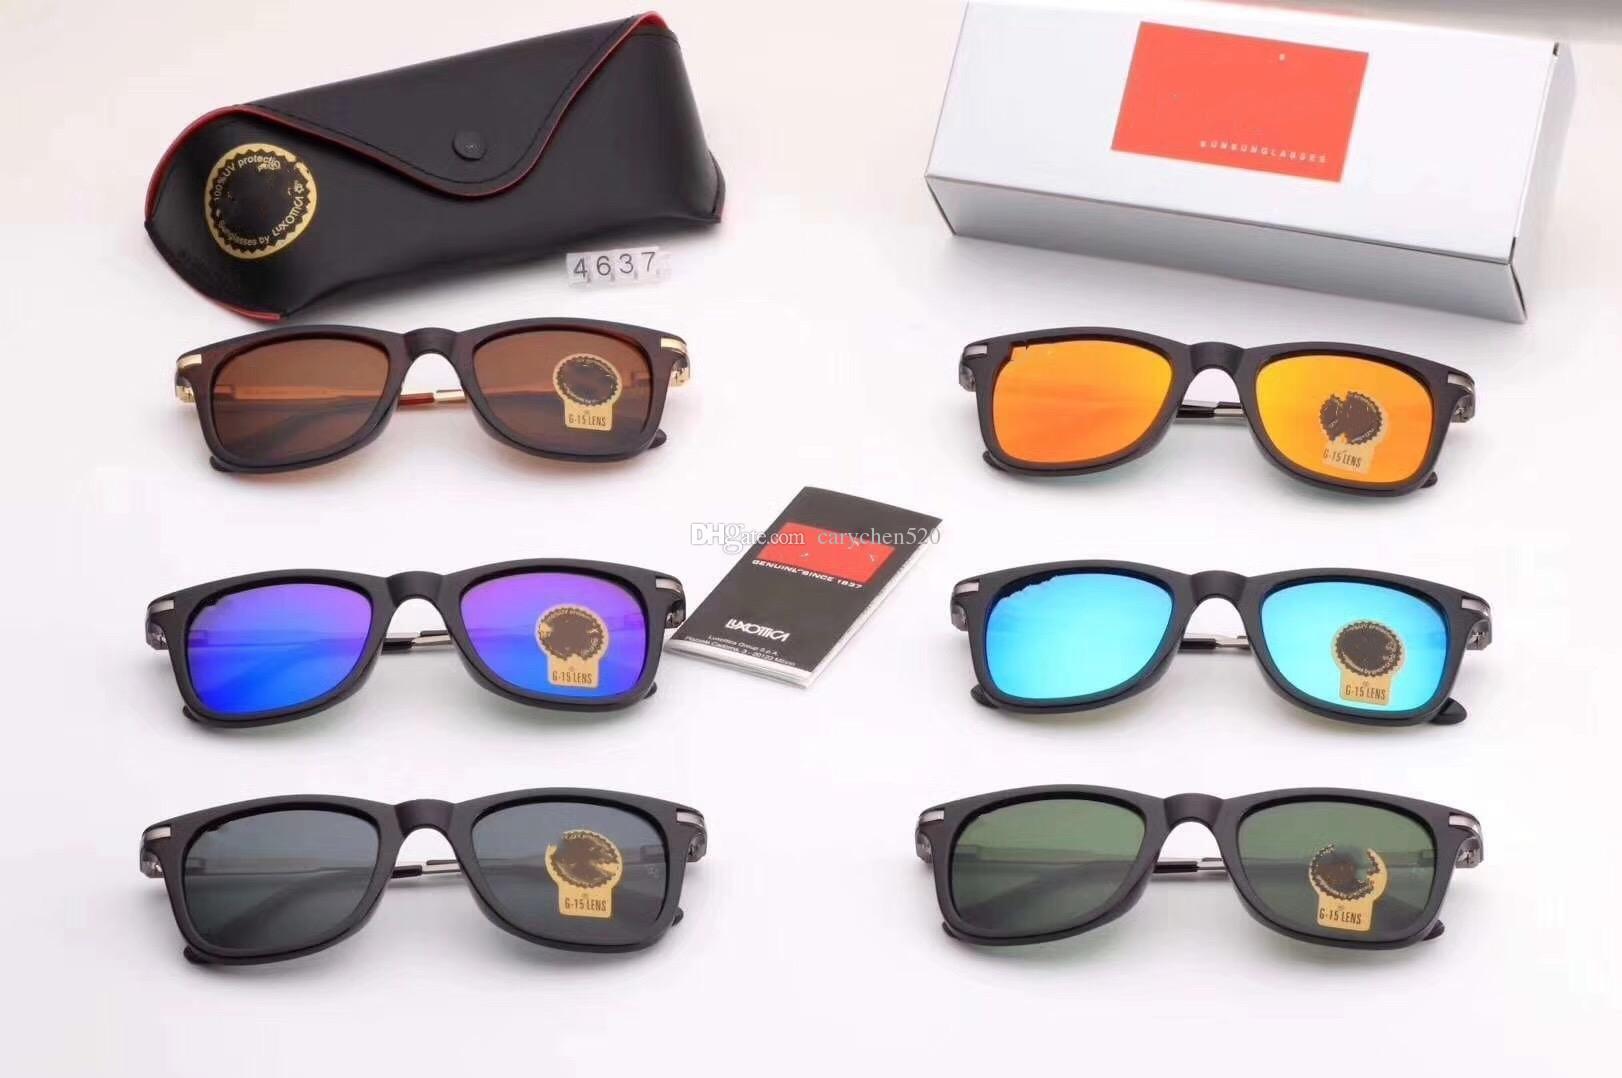 0581b564f4 New 4637 Men Retro Sunglasses Luxury Women Brand Designer Plank ...